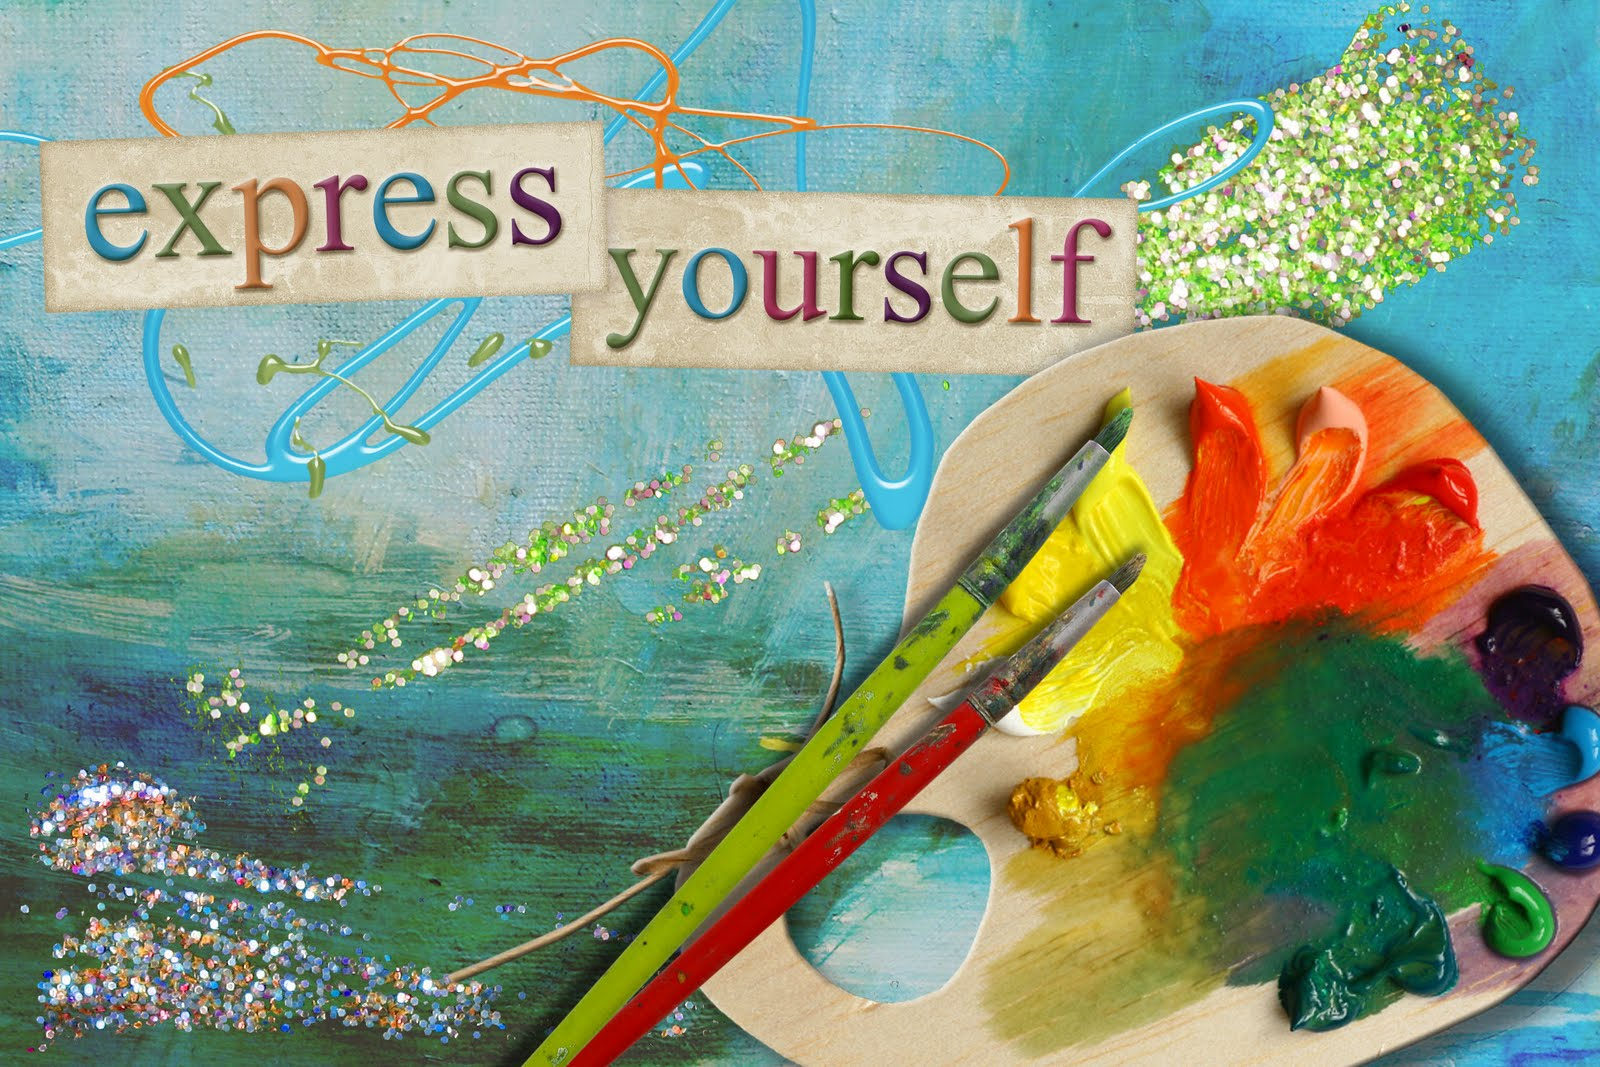 Expressions Expressions Express Yourself Express